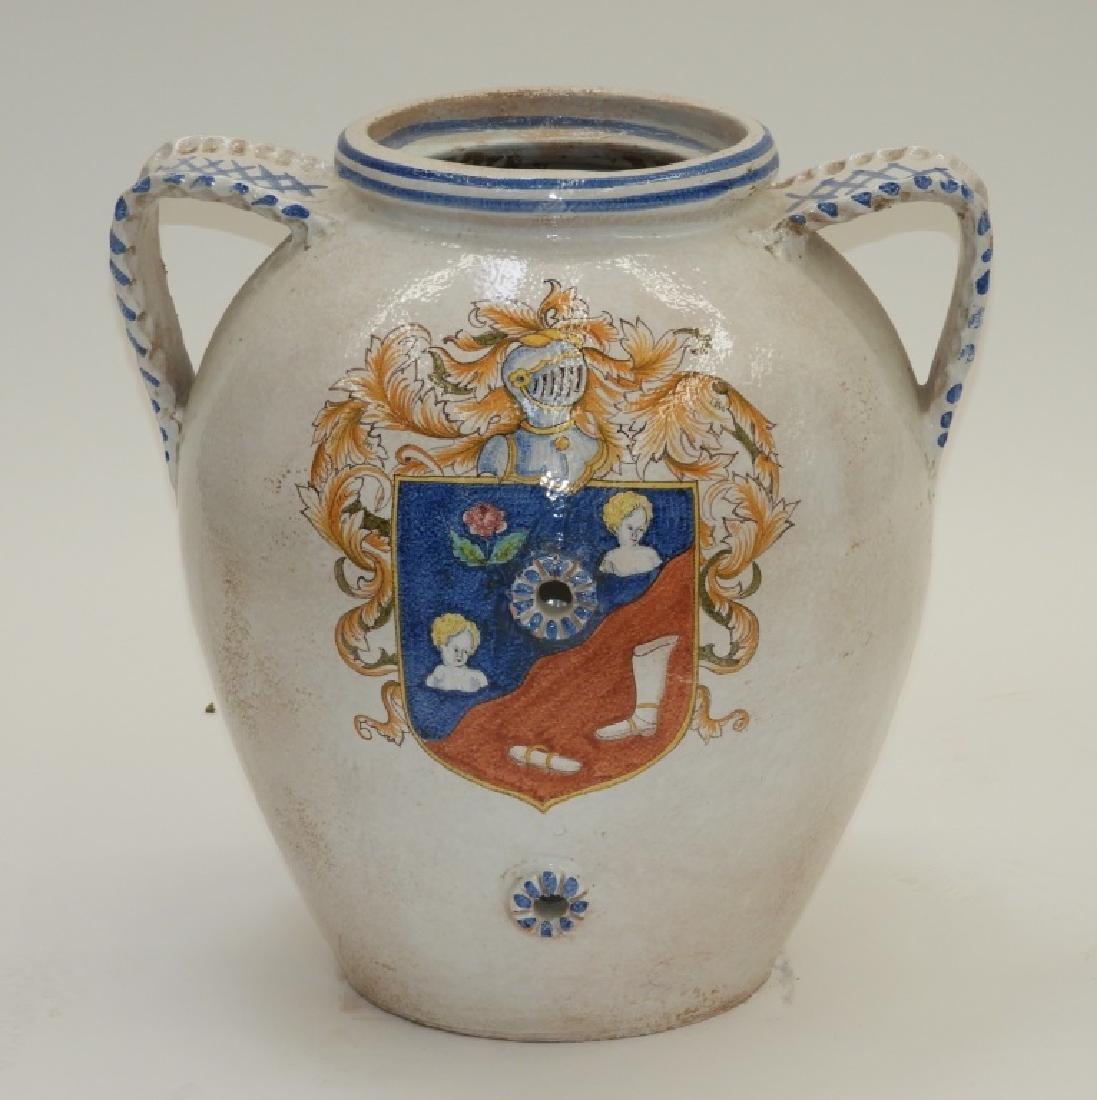 Italian Armorial Faience Majolica Pottery Vessel